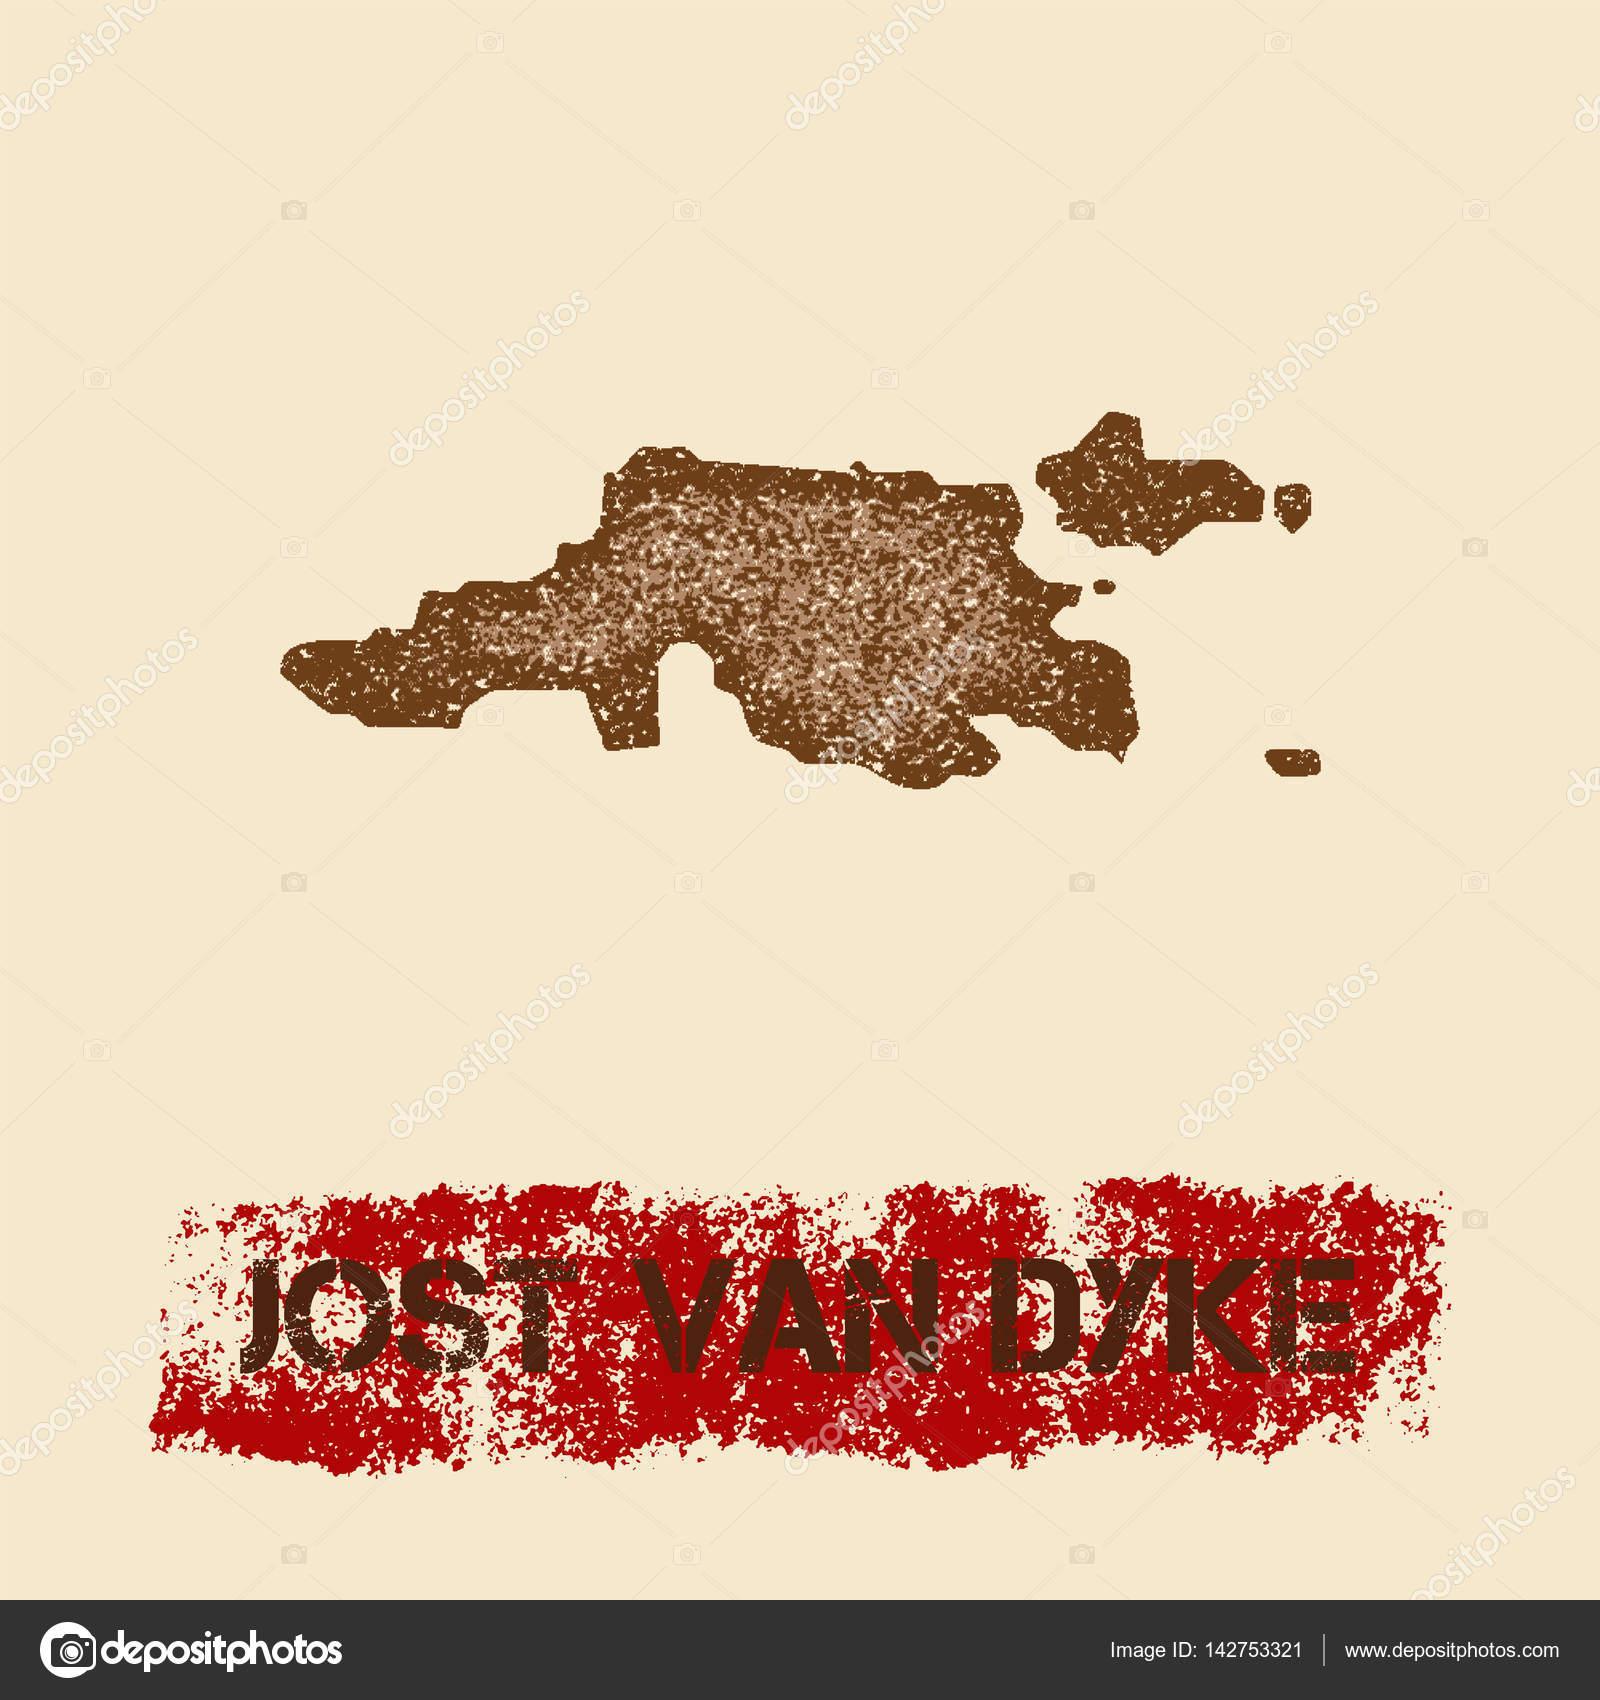 Jost Van Dyke distressed map Grunge patriotic poster with textured